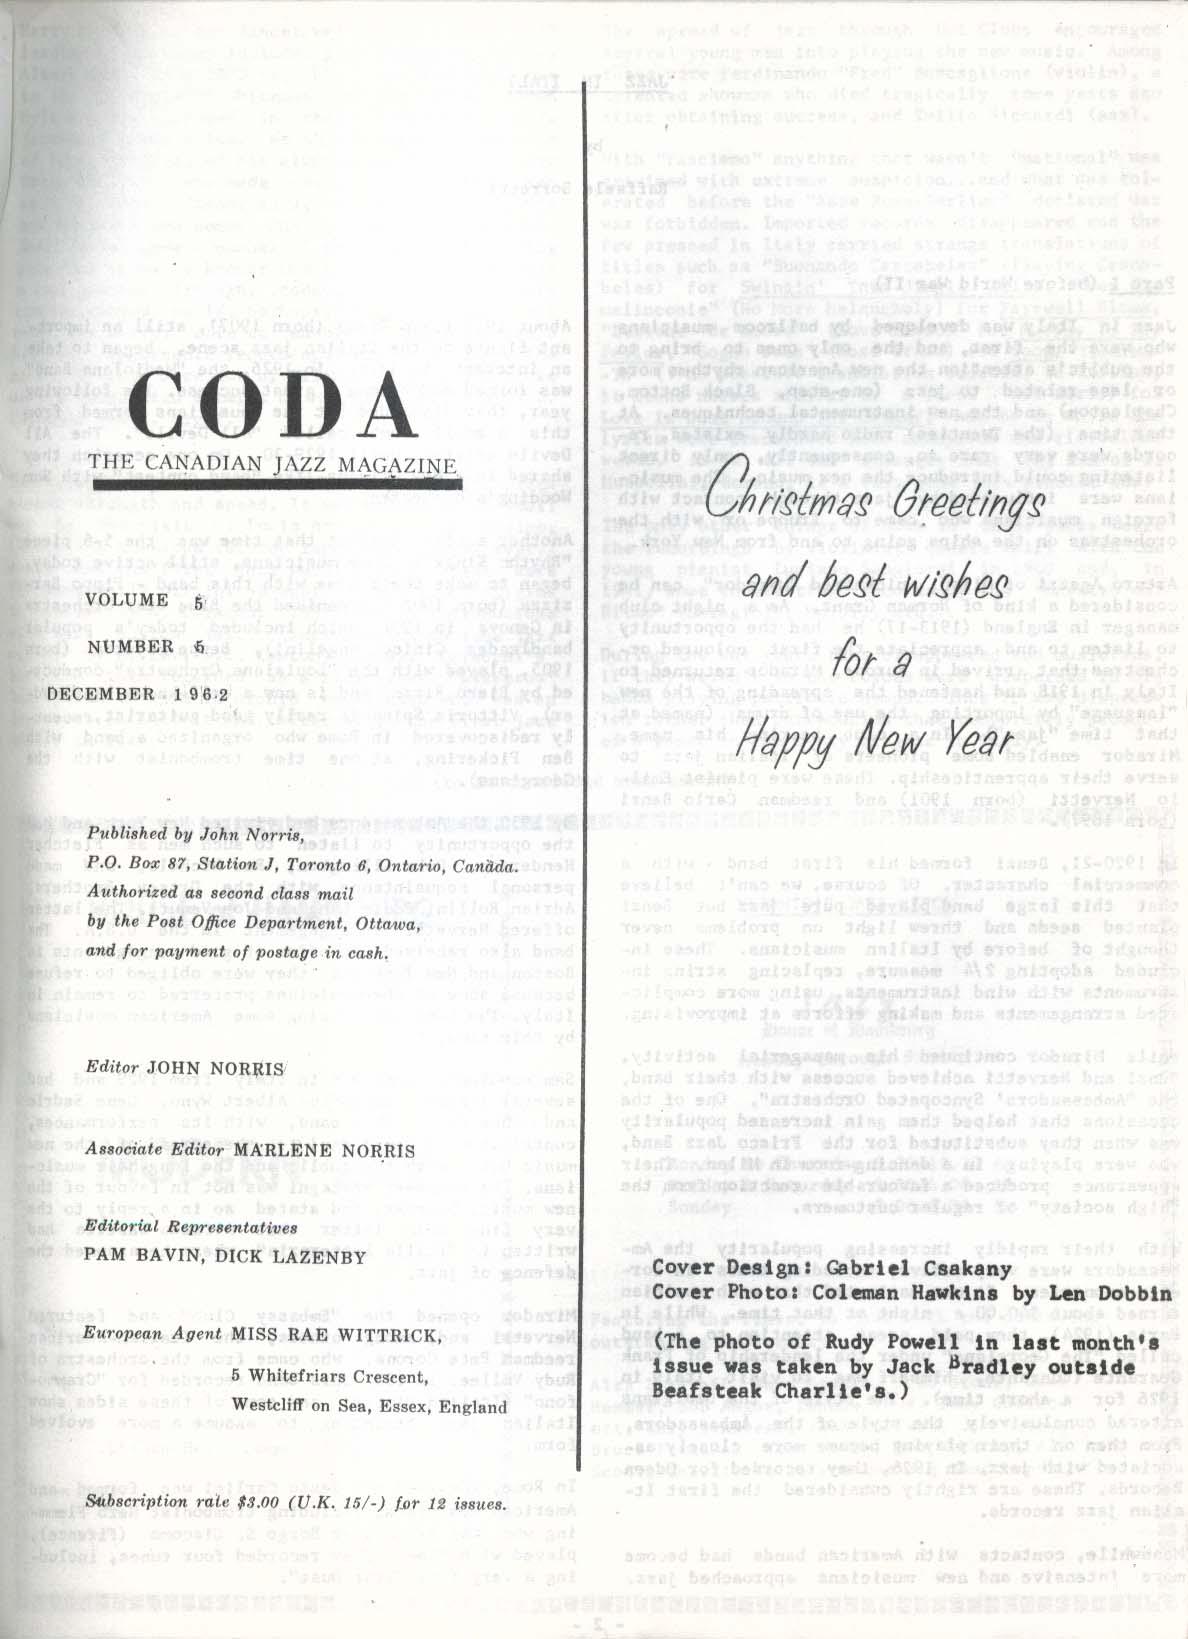 CODA V5 #5 Canadian Jazz Magazine Coleman Hawkins 12 1962